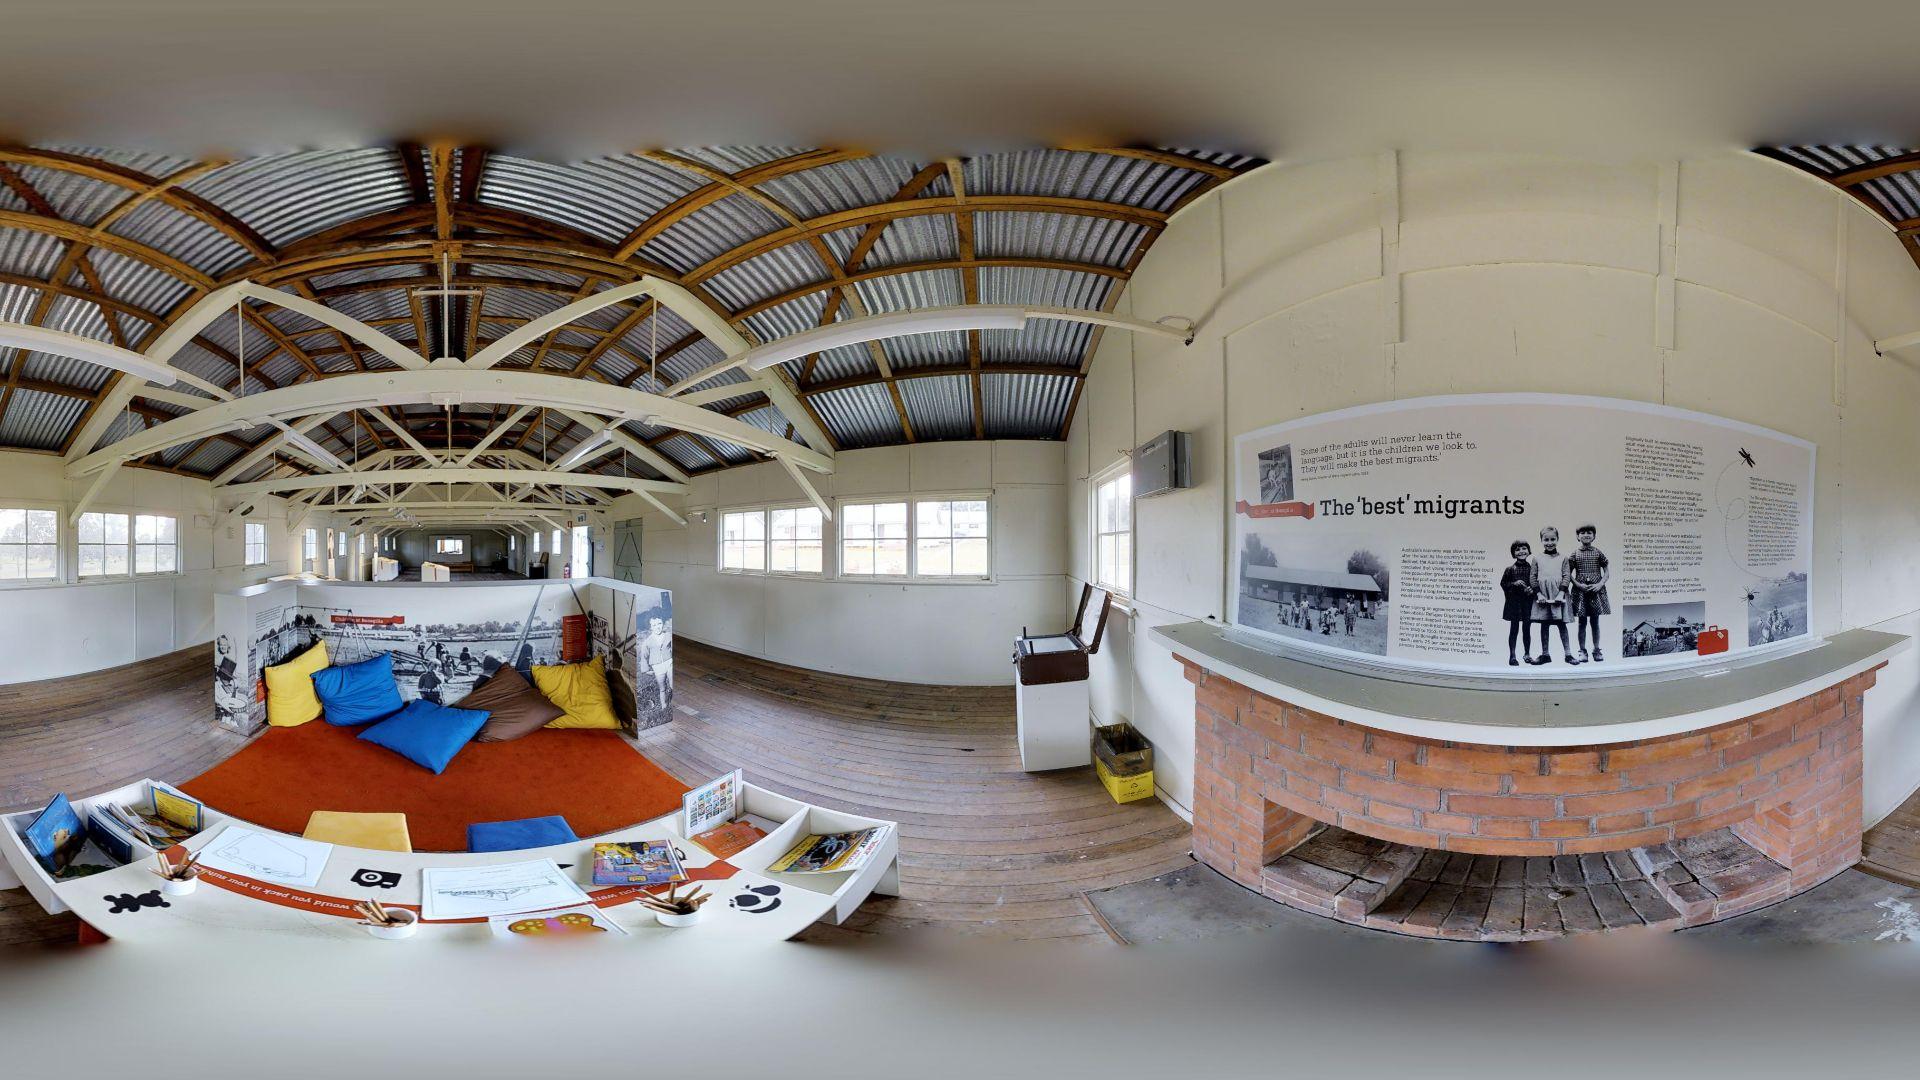 Charles Sturt academics create 3D virtual tour of the migrant experience in Bonegilla's Block 19